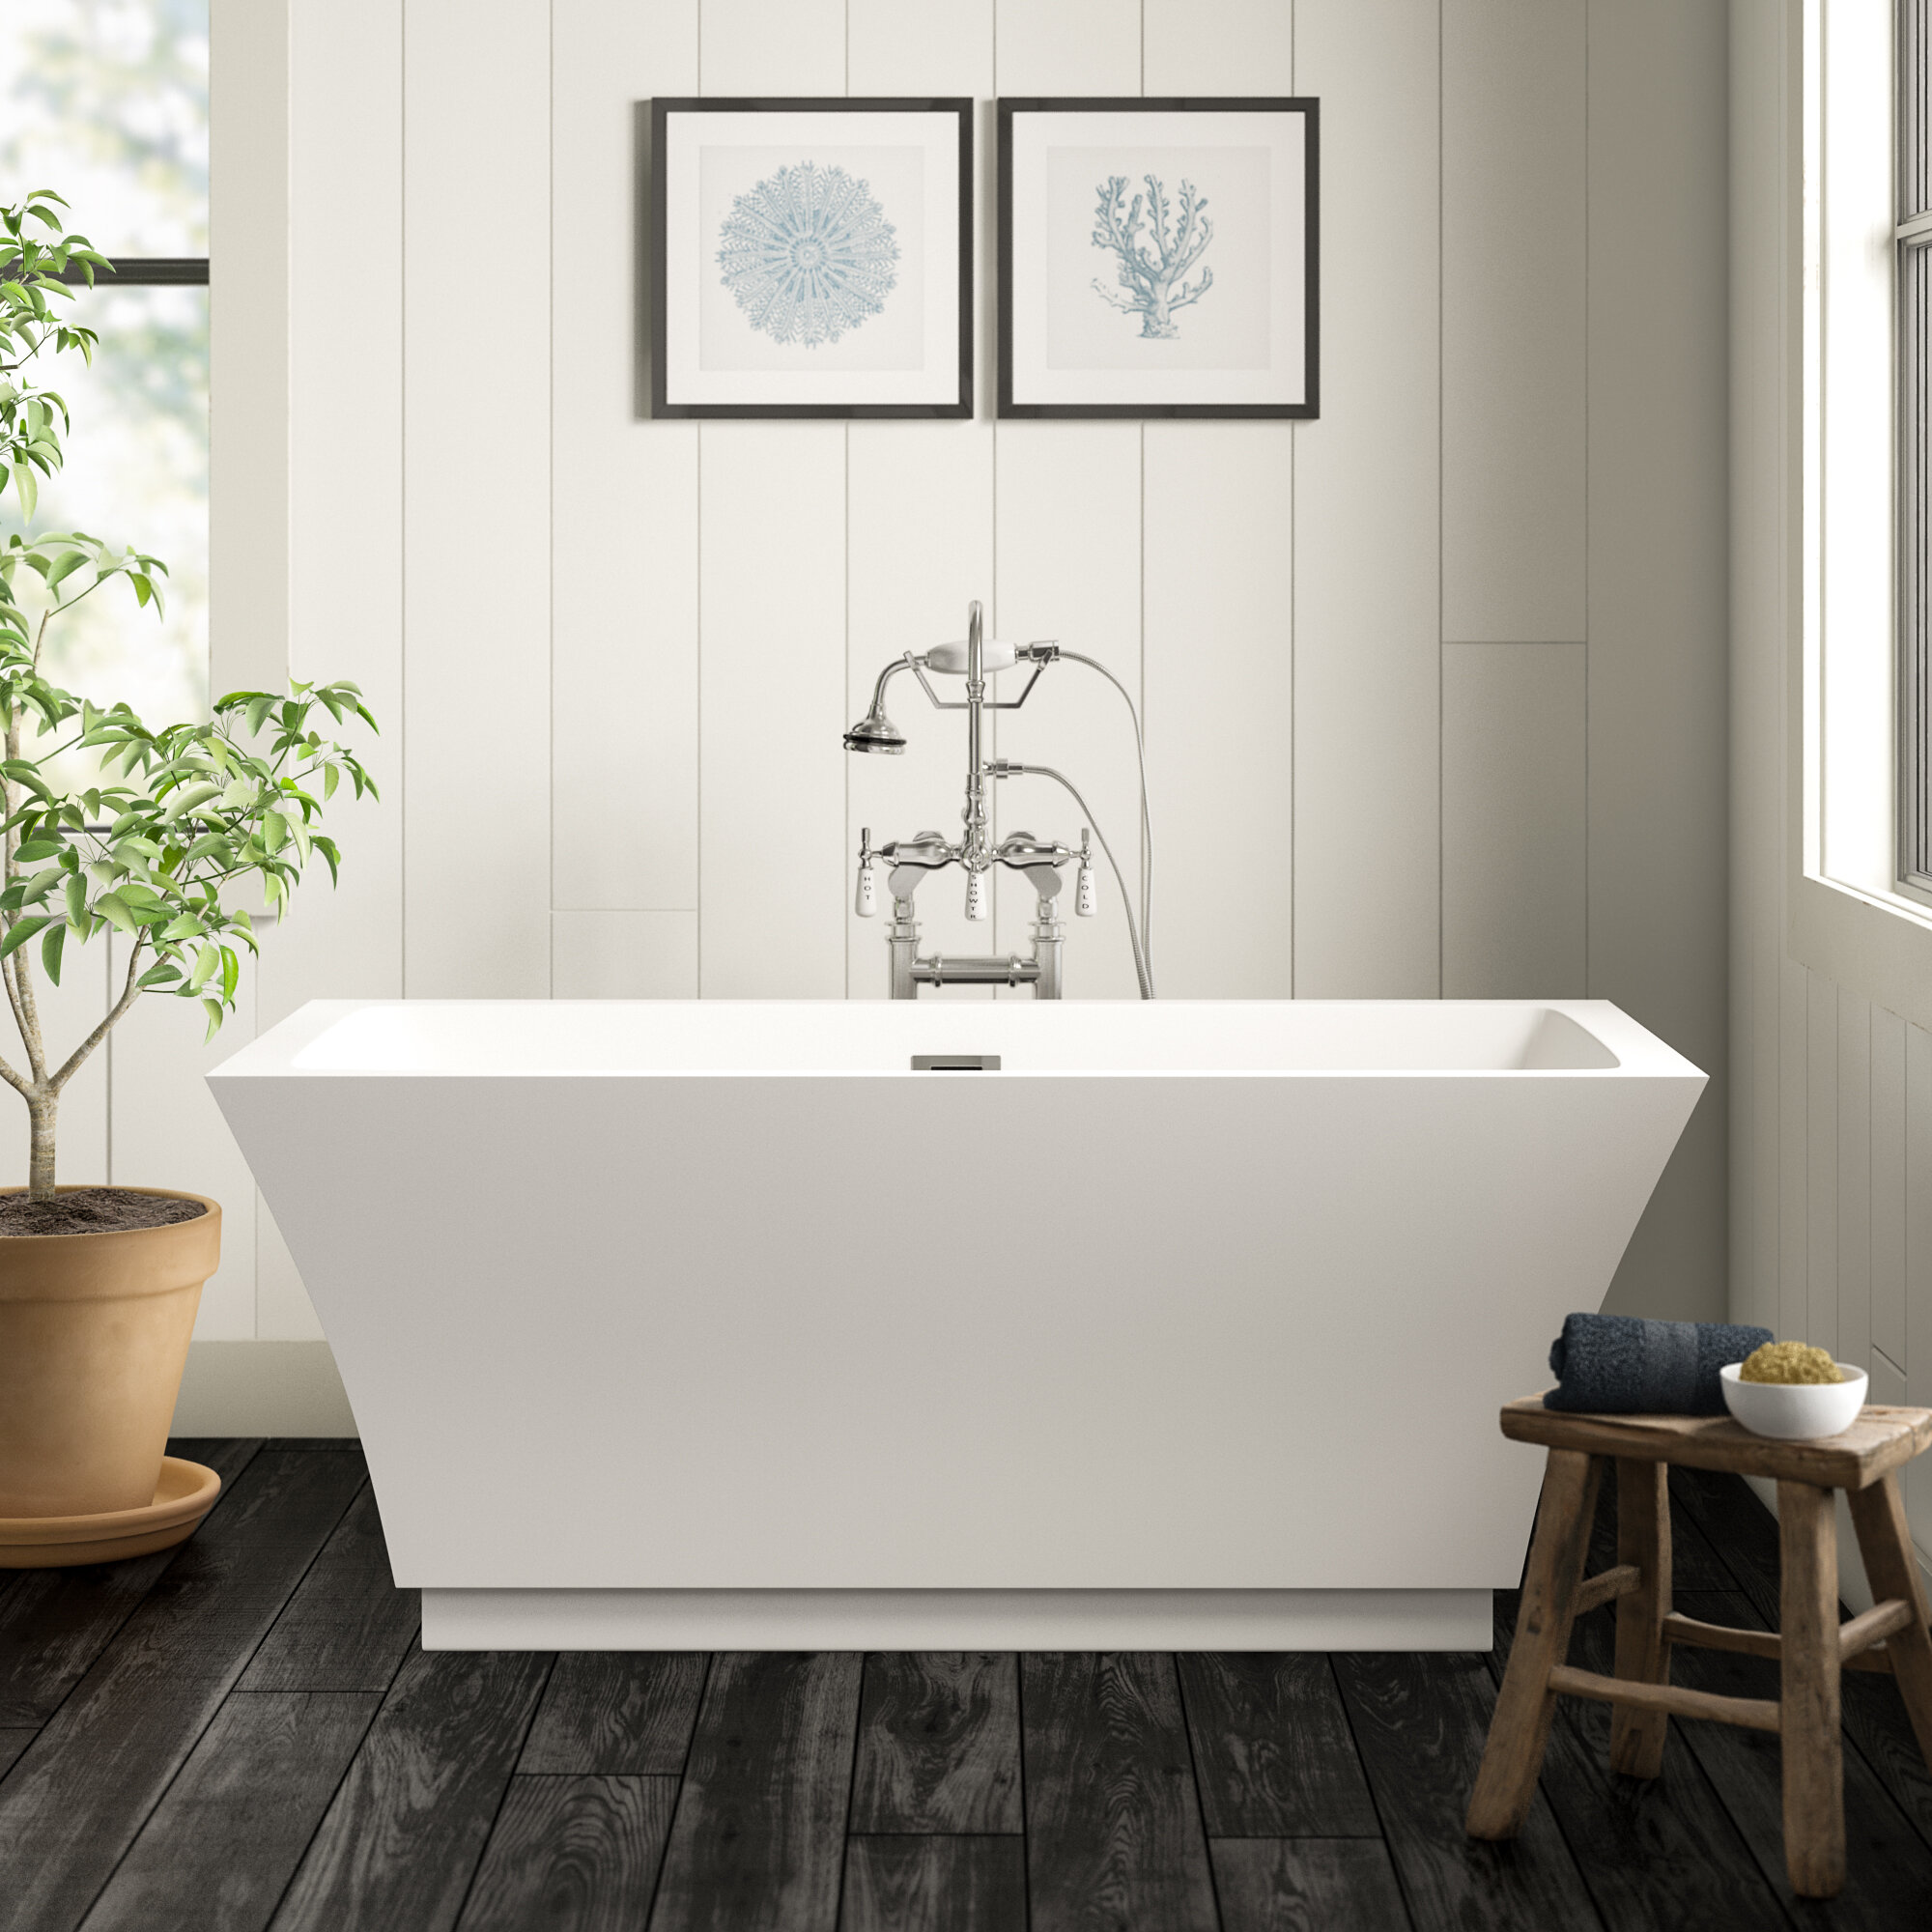 Birch Lane Anatoli 59 X 30 Freestanding Soaking Bathtub Reviews Wayfair